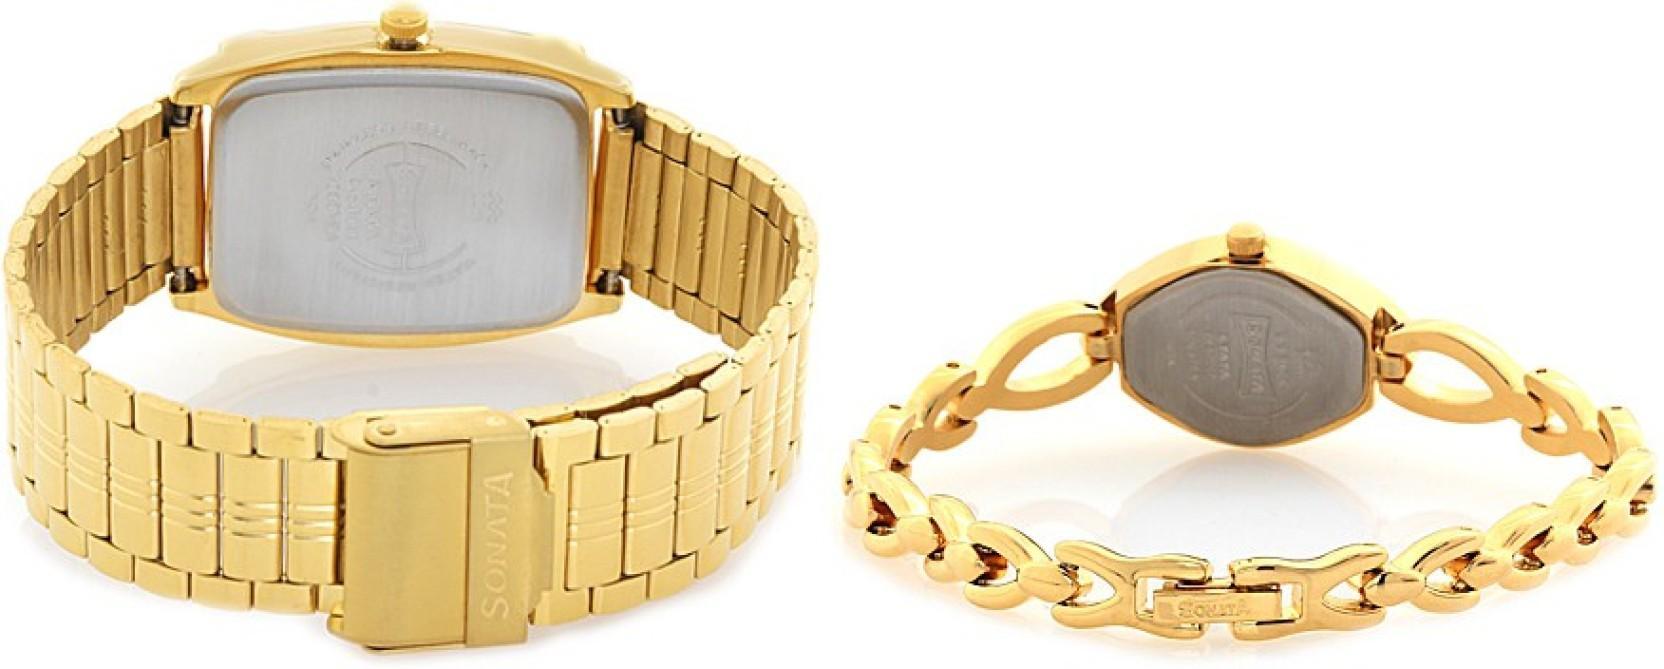 Sonata 70808069YM02C Watch - For Men